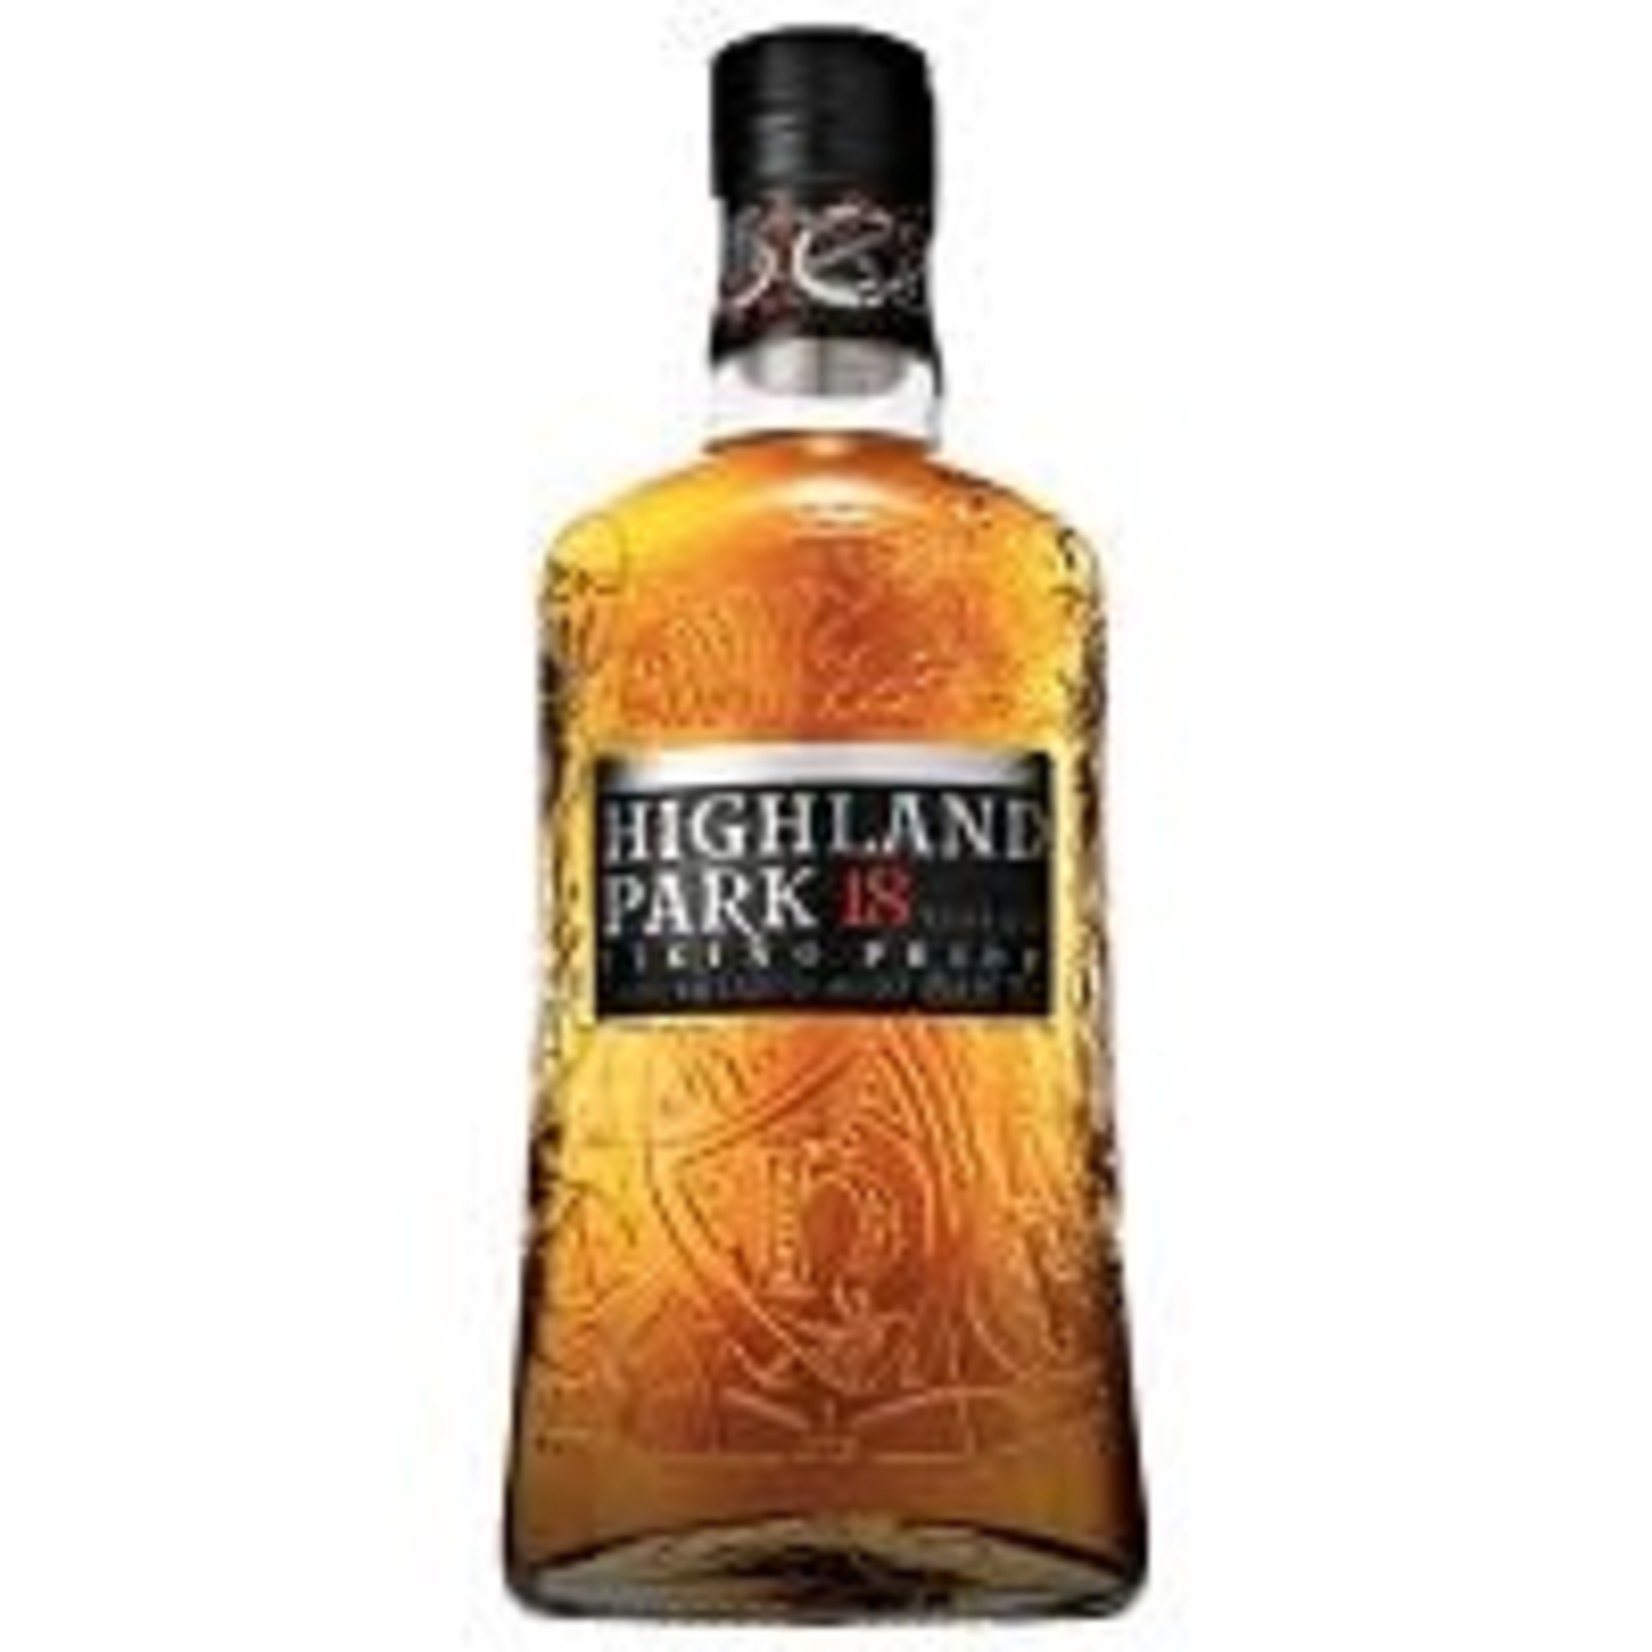 Spirits Highland Park 18 Year Viking Pride Orkney Island Scotch